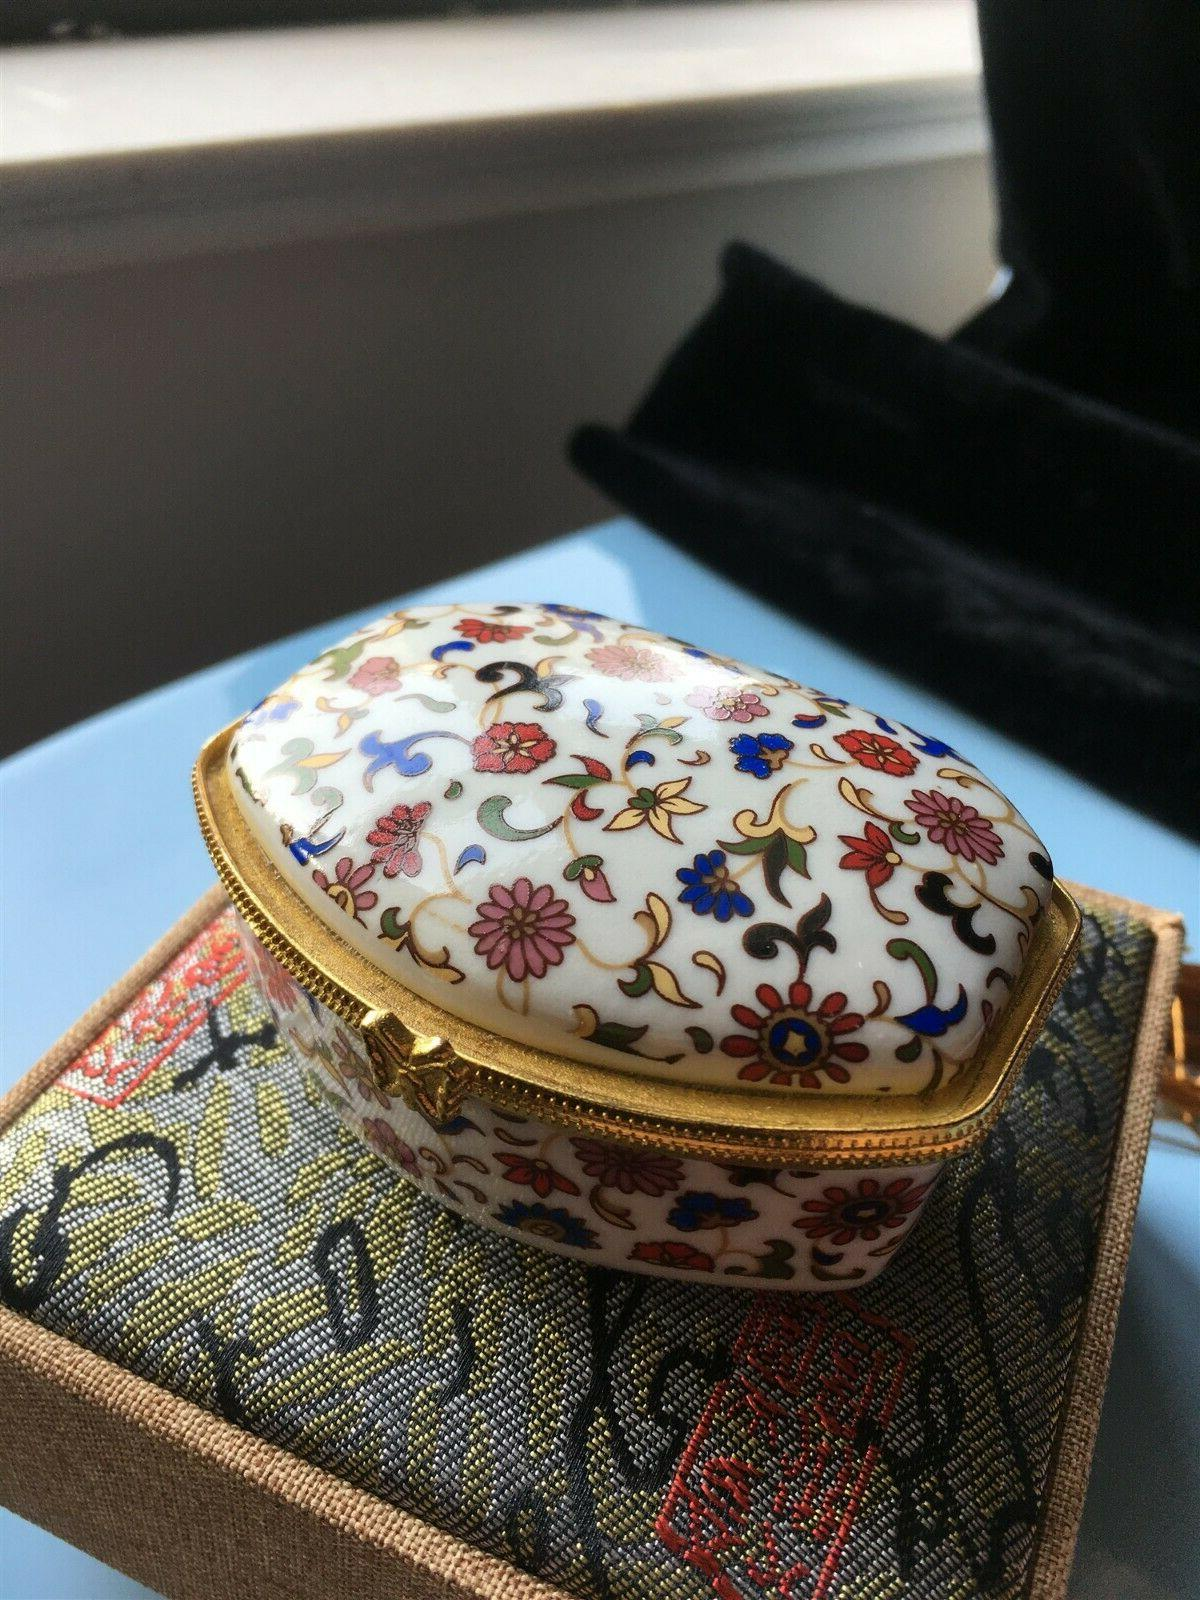 white rhomboid china jewelry and makeup mirror